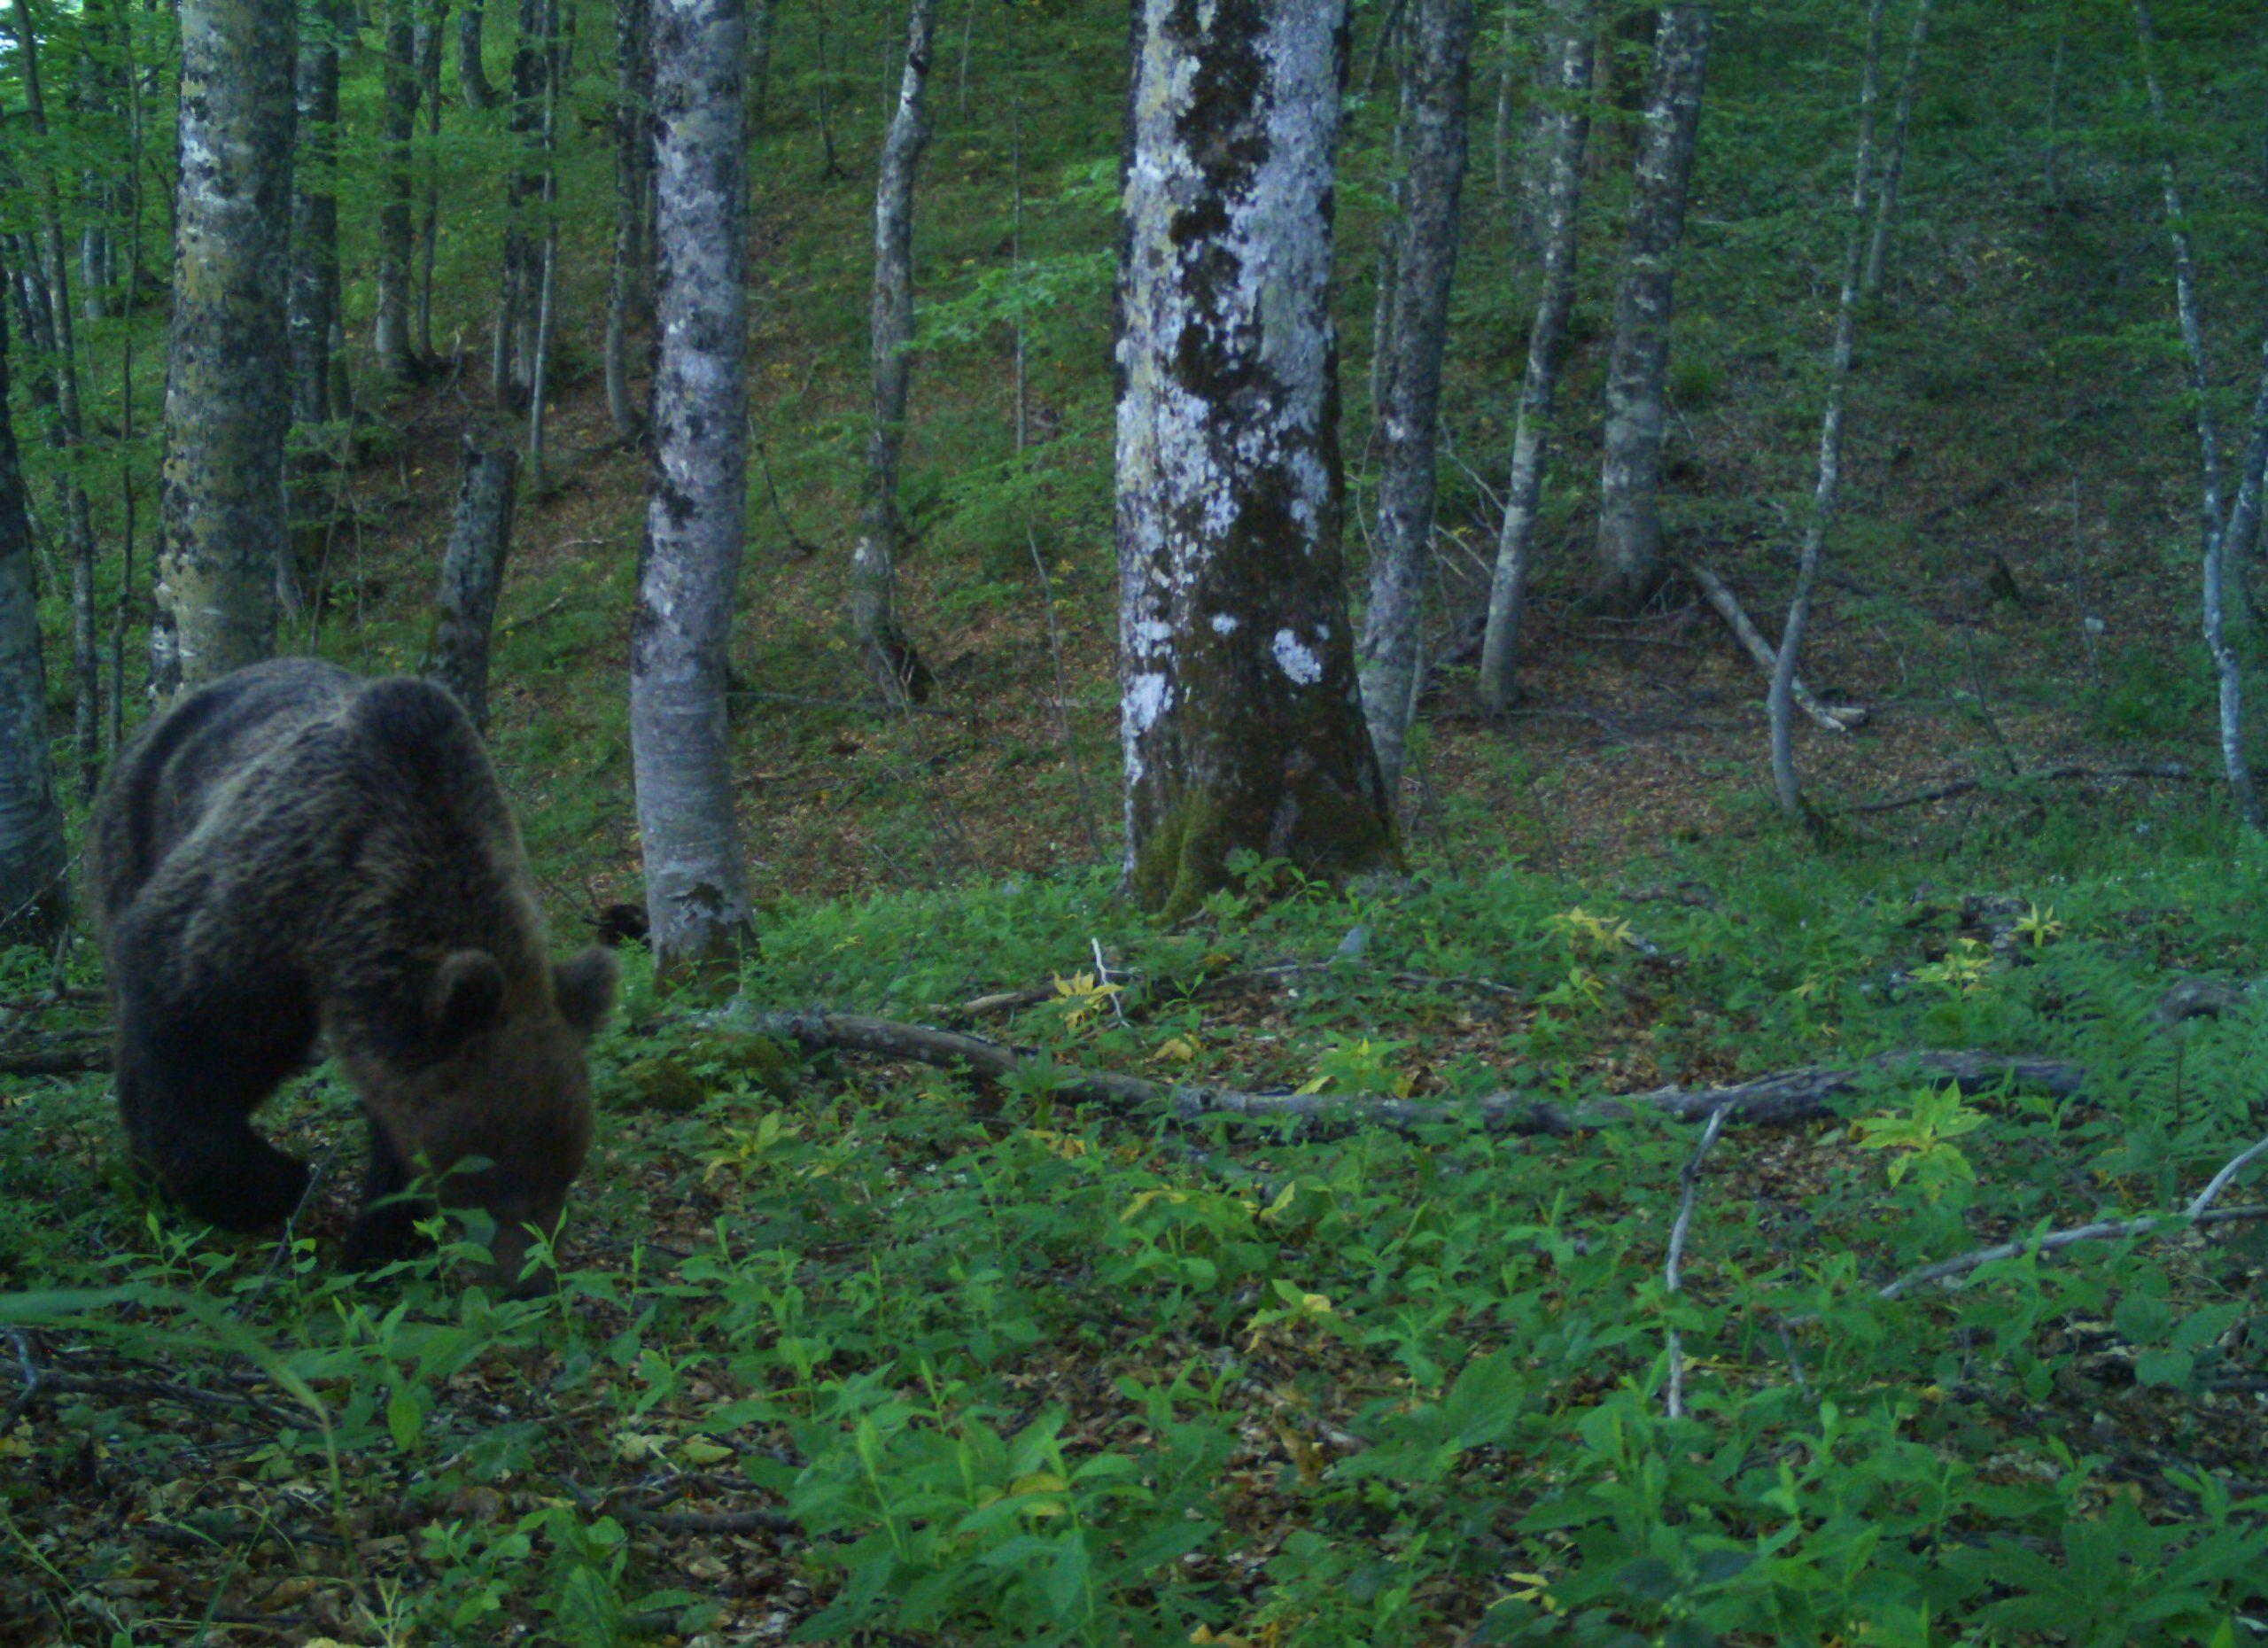 MEET THE CELEBRITY BEAR FROM MONTENEGRO